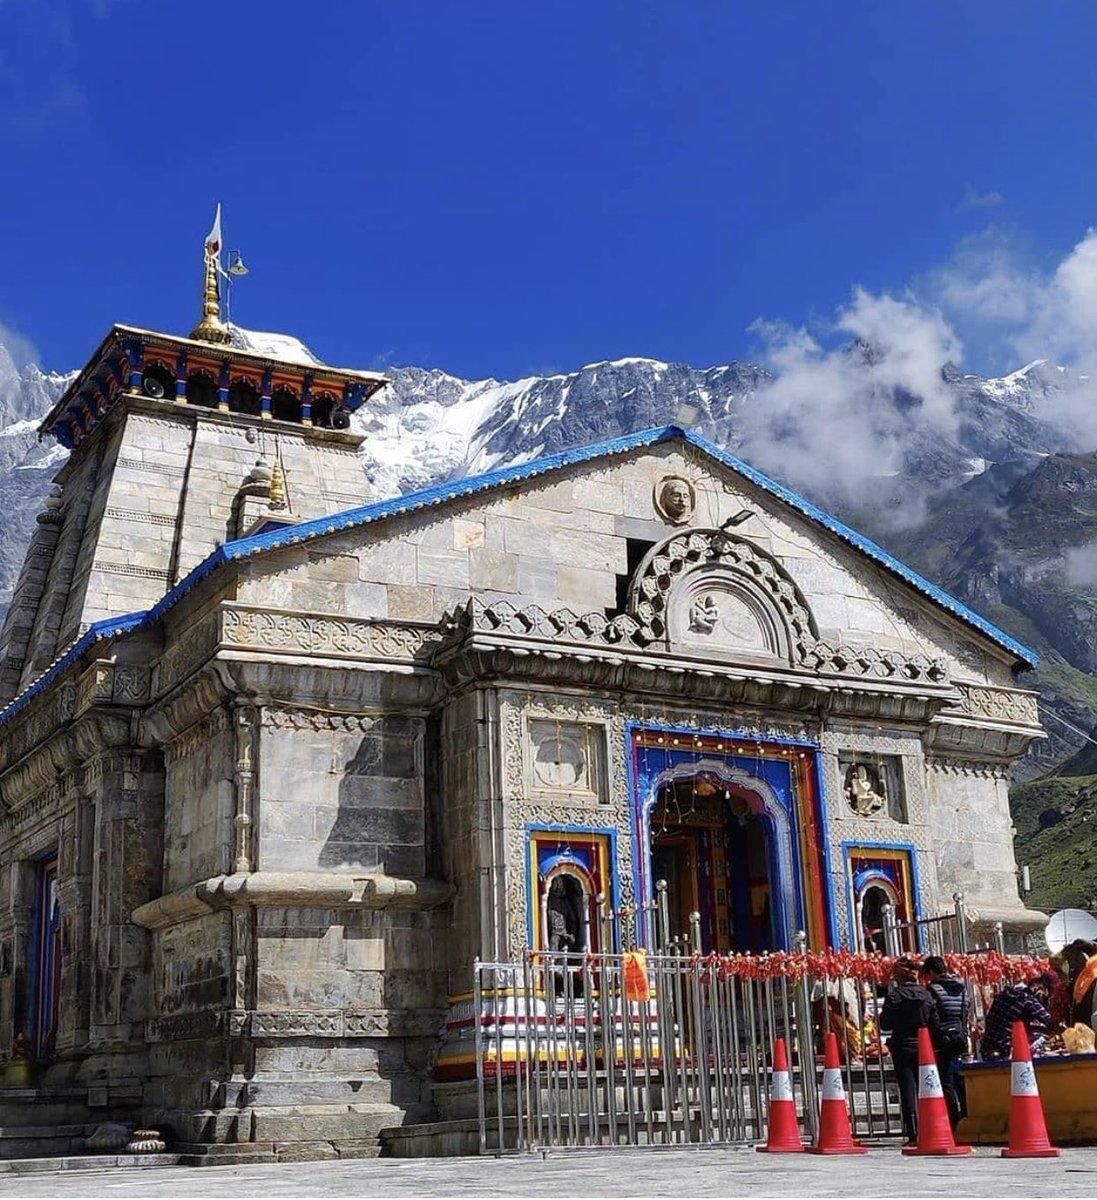 🙏🏻🙏🏻 #ॐ_नमः_शिवाय  #omnamahshivay #ॐ #Kedarnath #केदारनाथ https://t.co/qzr8o9cwc4